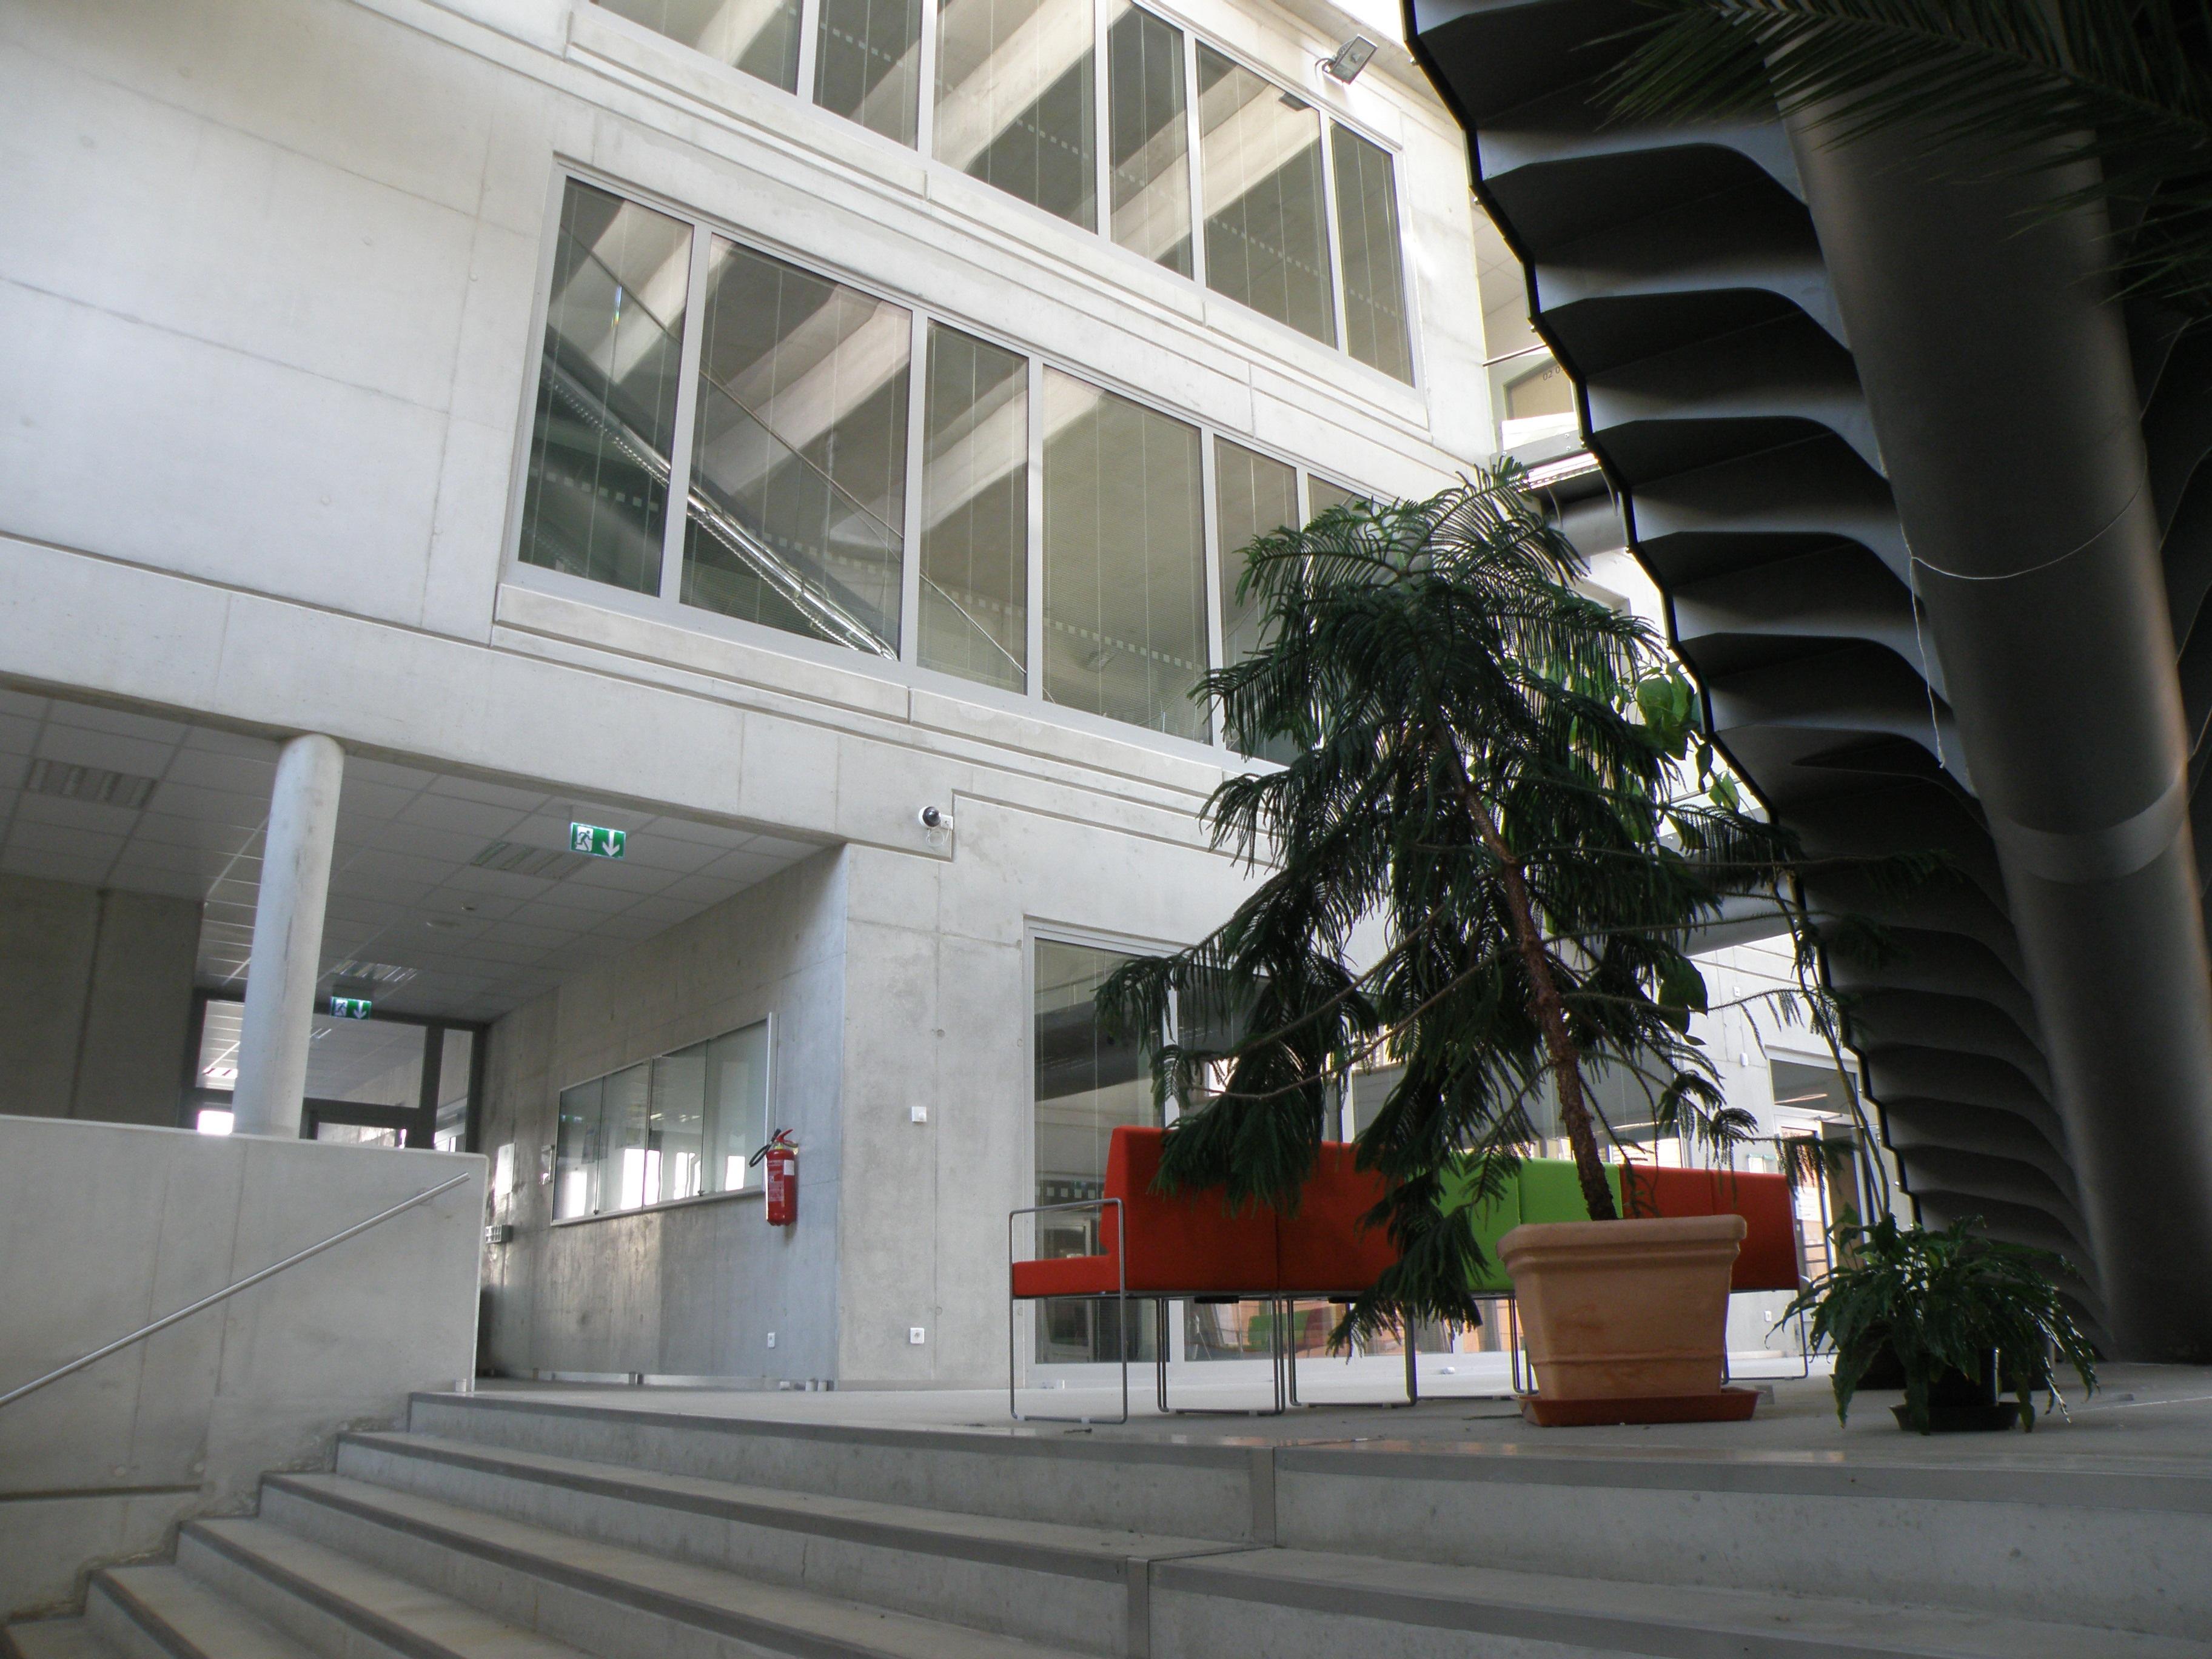 Free Images : architecture, building, atrium, space, facade, modern ...